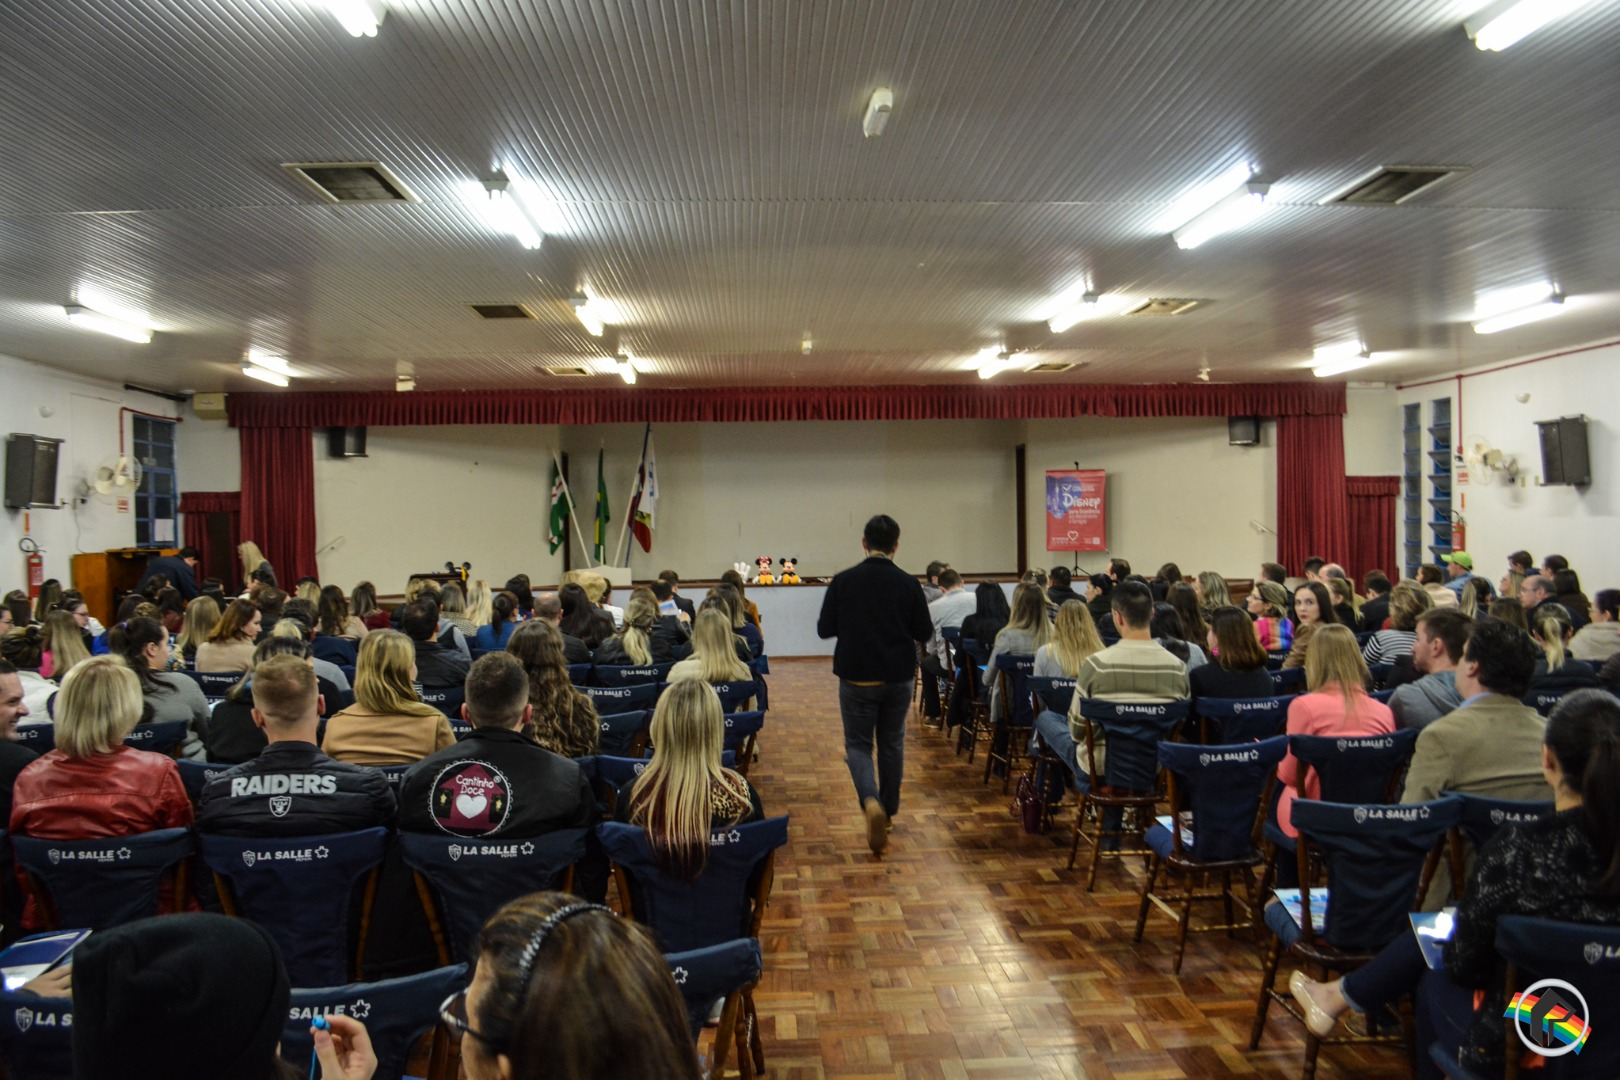 Palestra da JCI lota auditório do La Salle Peperi em São Miguel do Oeste